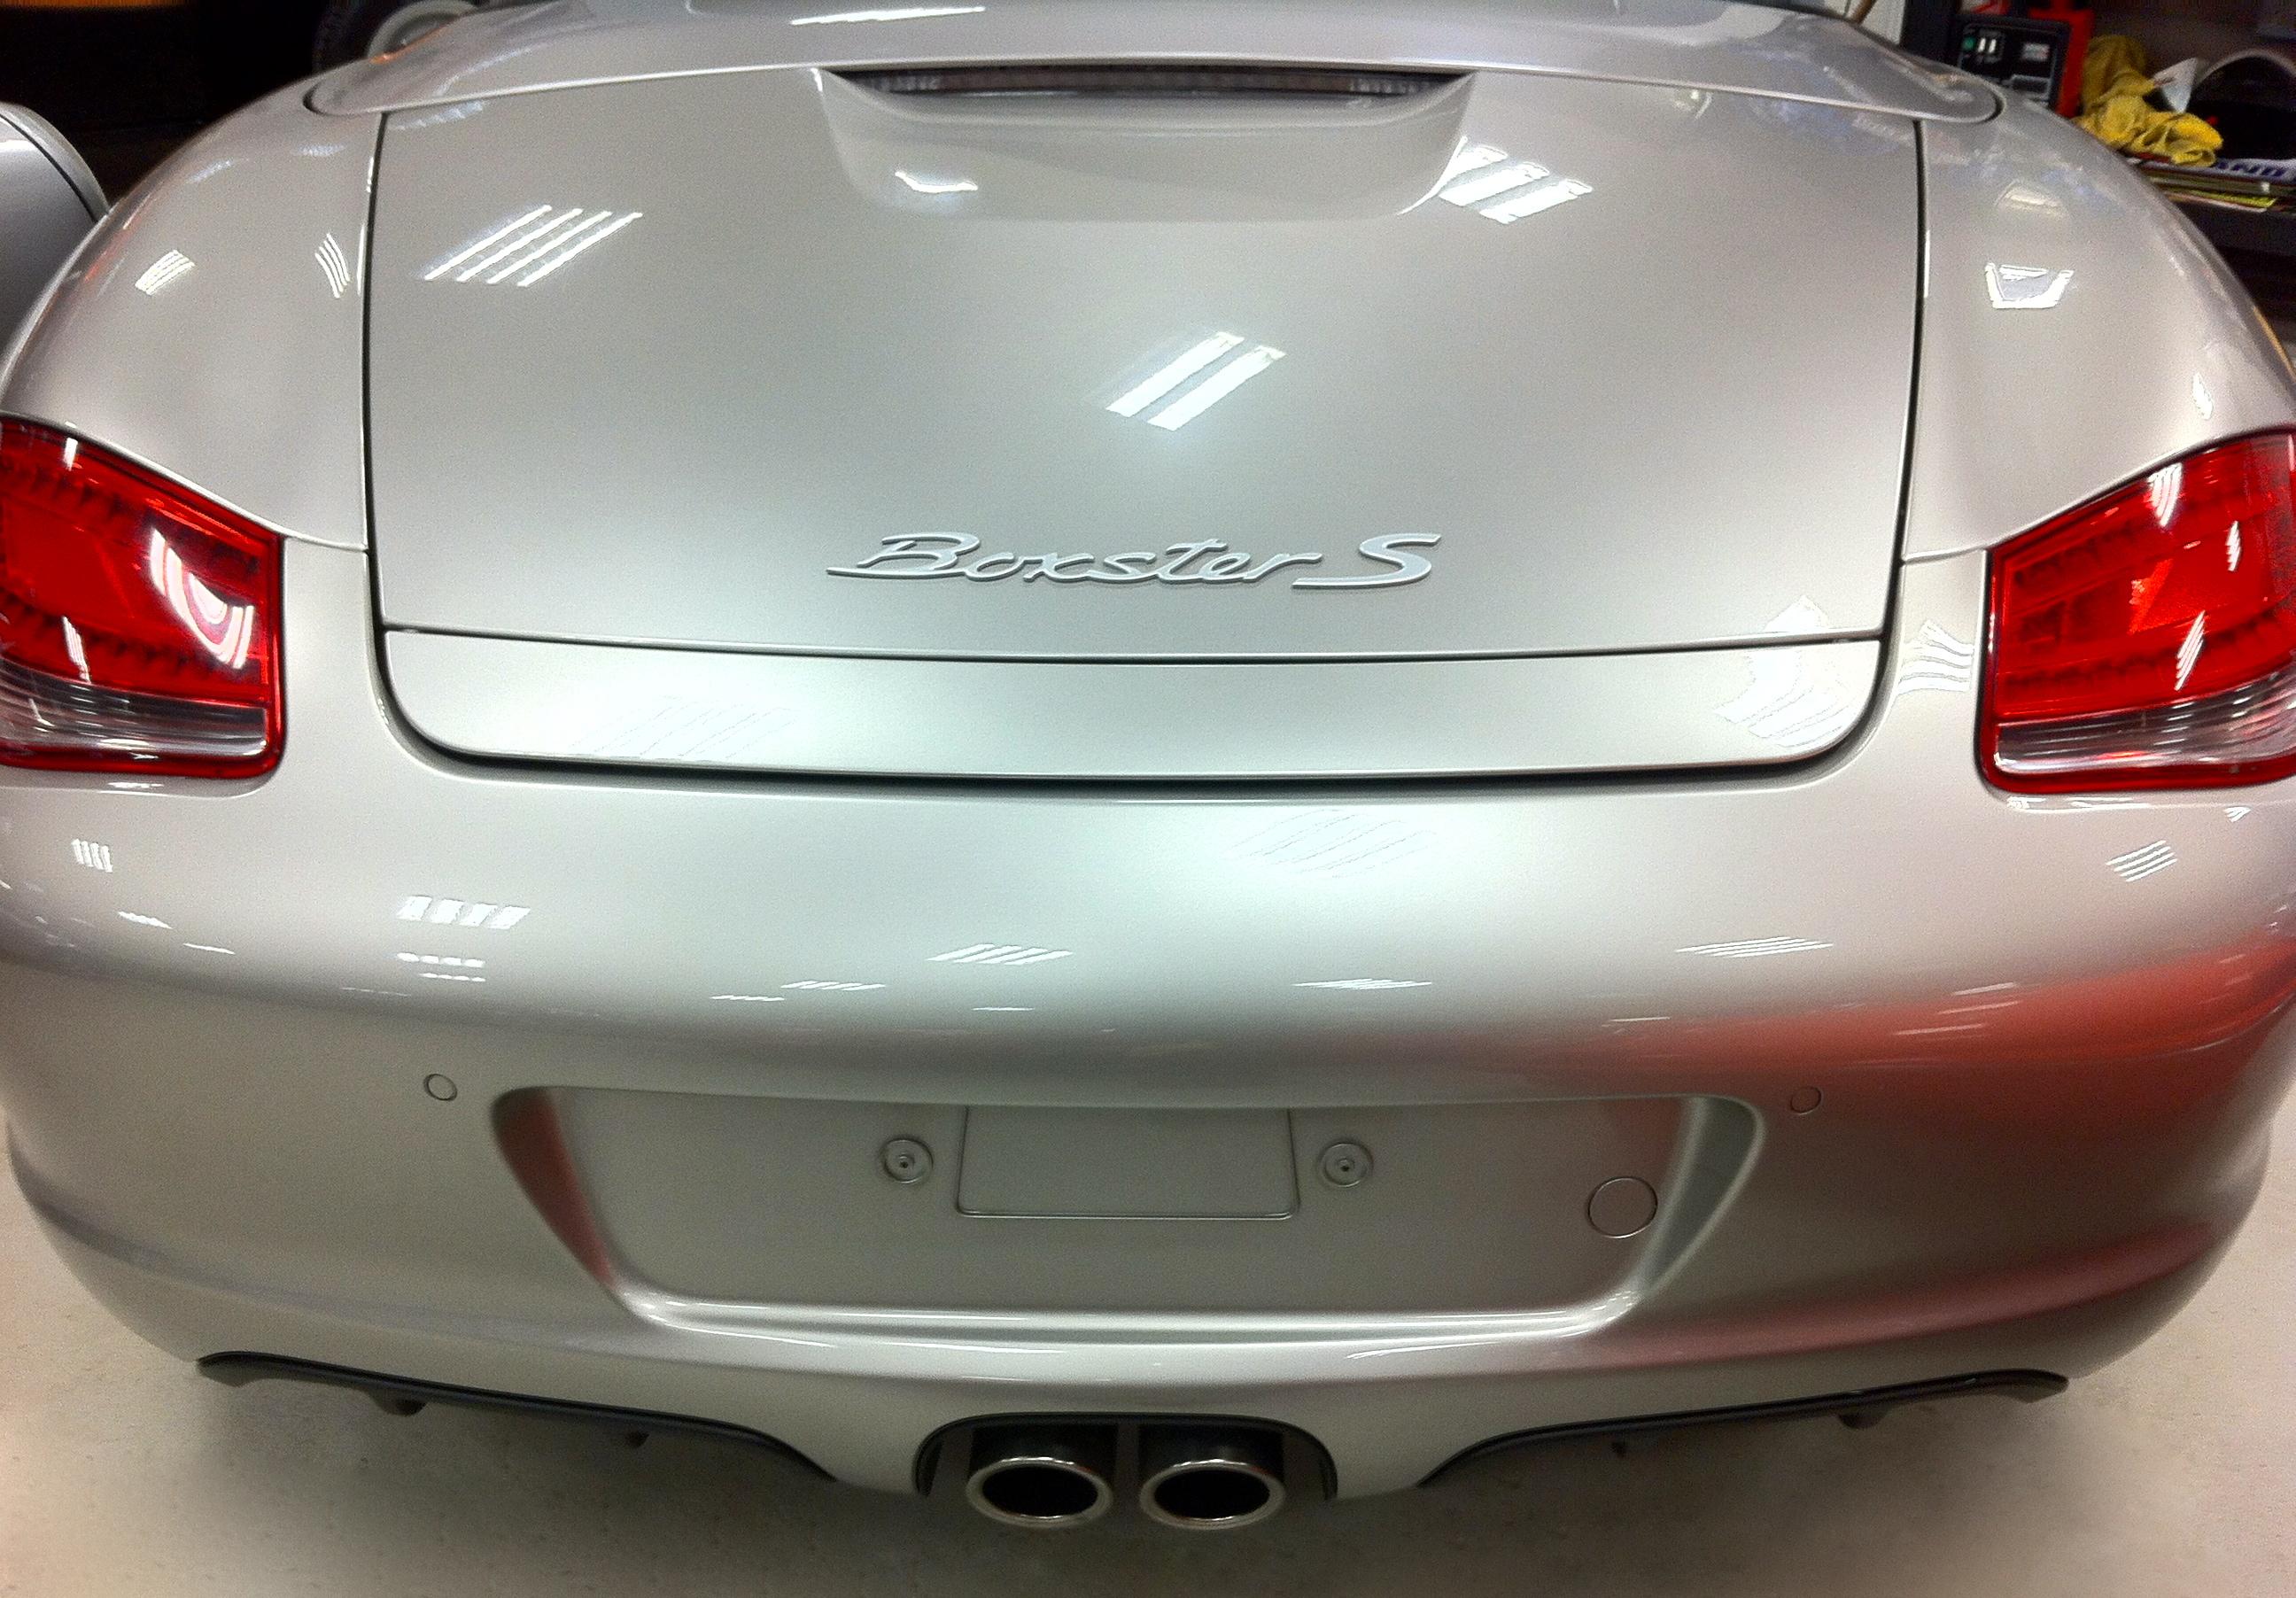 Porsche Boxster S 987 Pdk Border Reiversborder Reivers